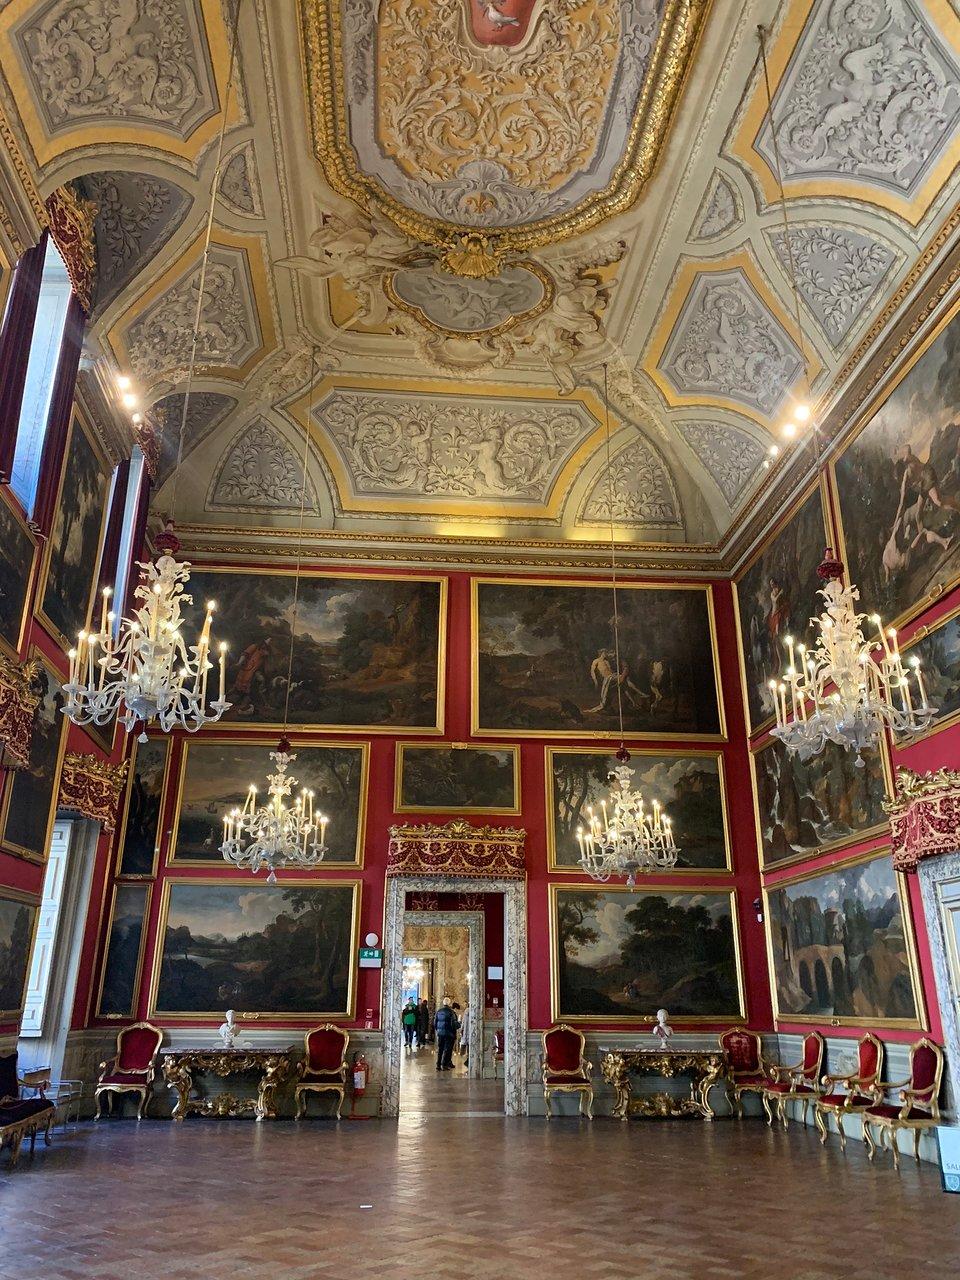 Palazzo Doria Pamphilj Rome 2020 All You Need To Know